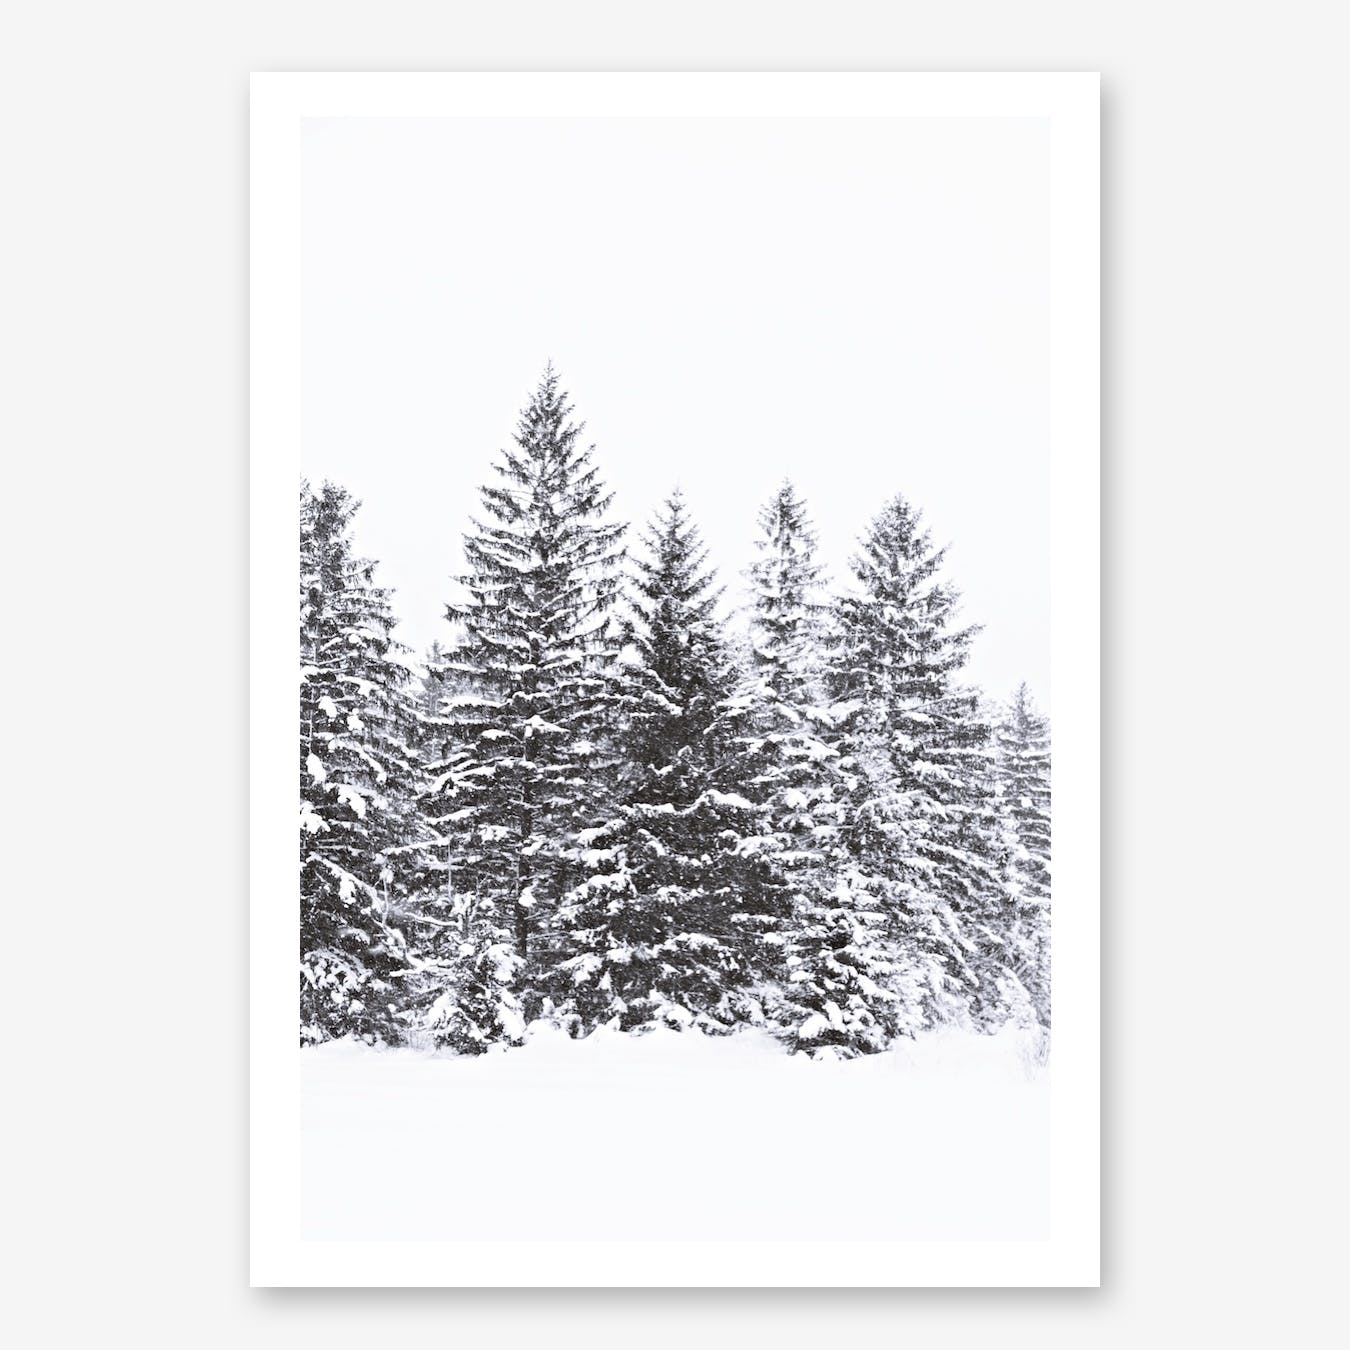 Black Winter Trees in Print